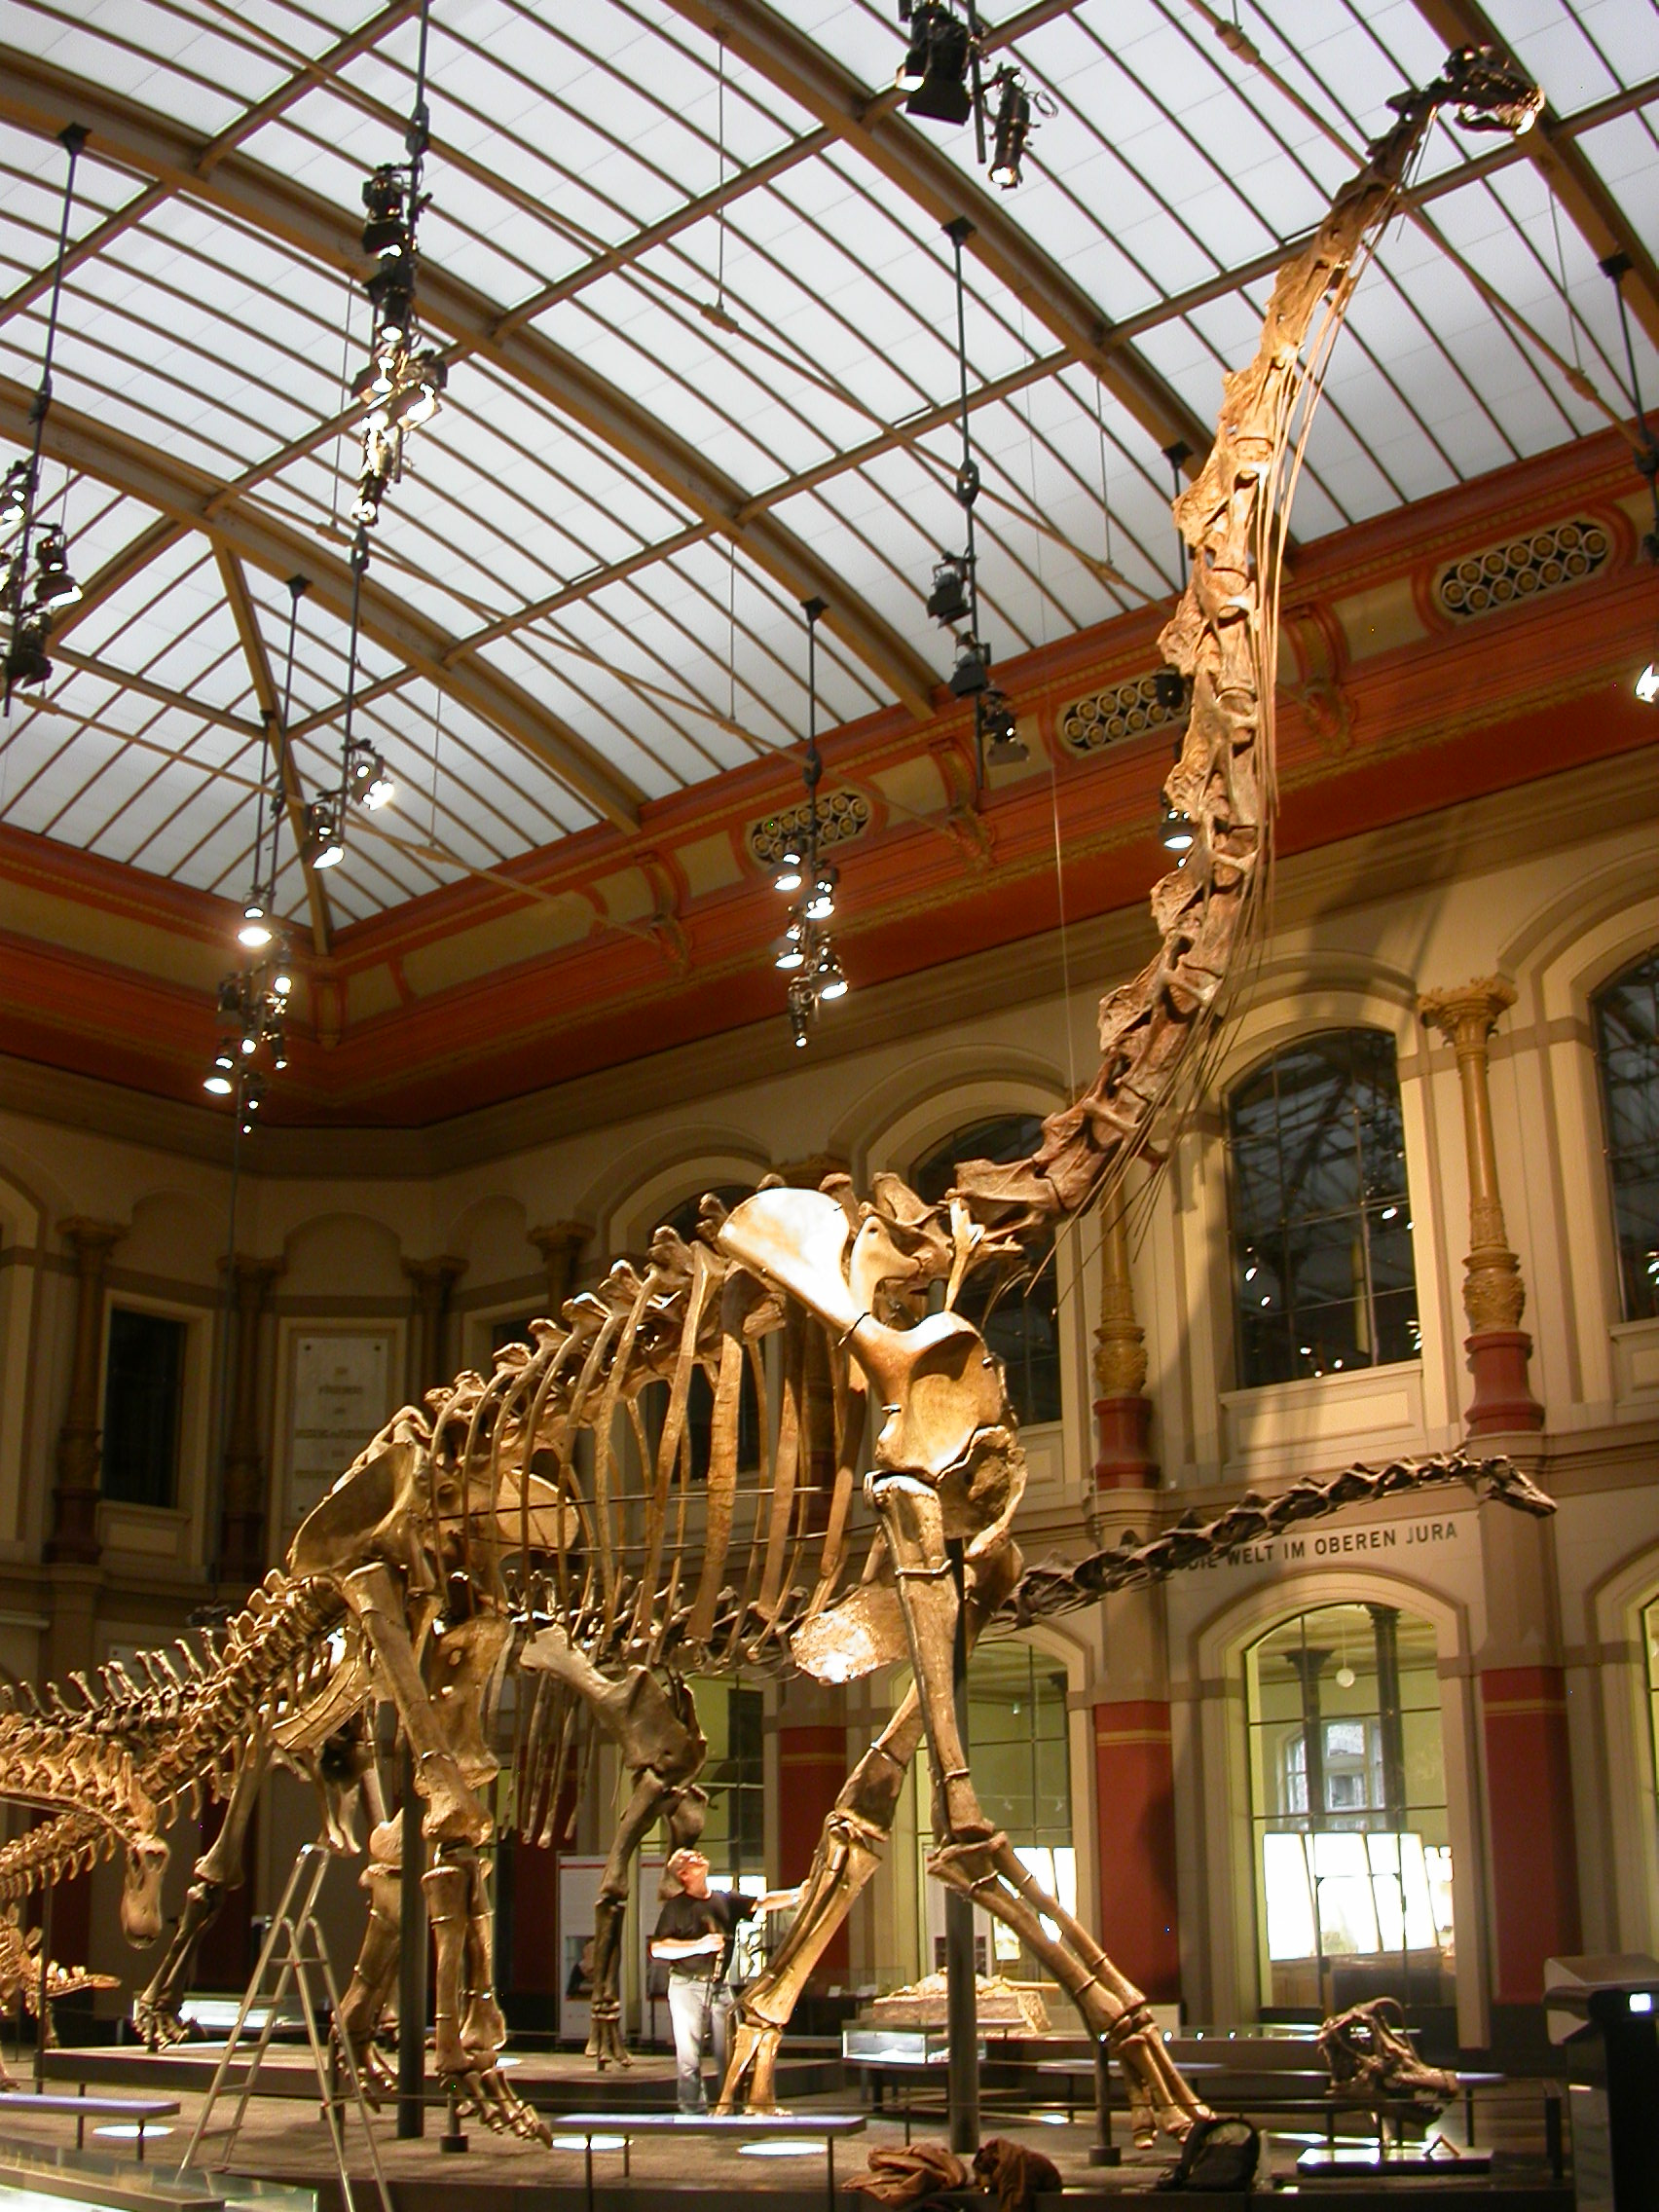 brachiosaurus sauropod vertebra picture of the week